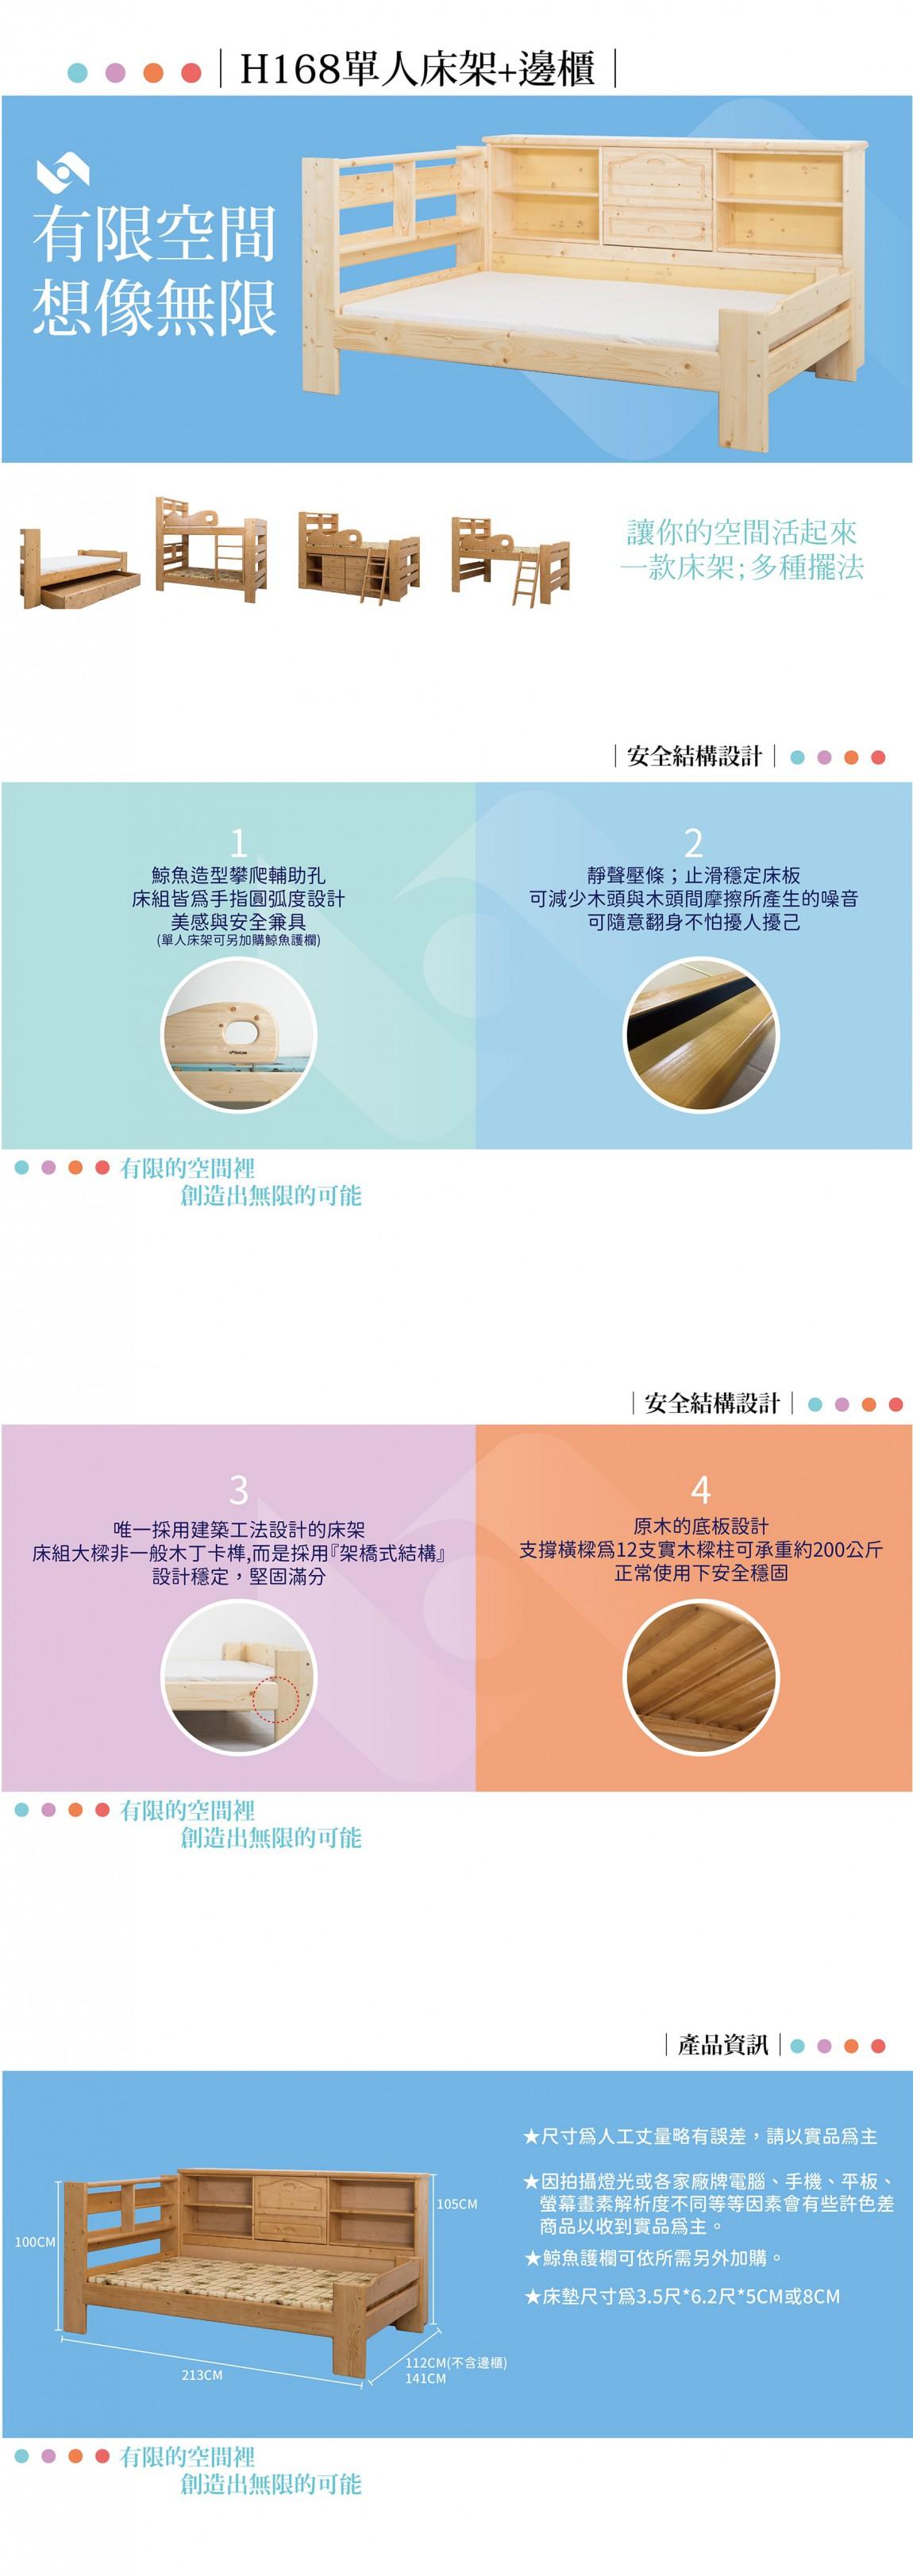 H168單人床架+邊櫃  商品介紹-min